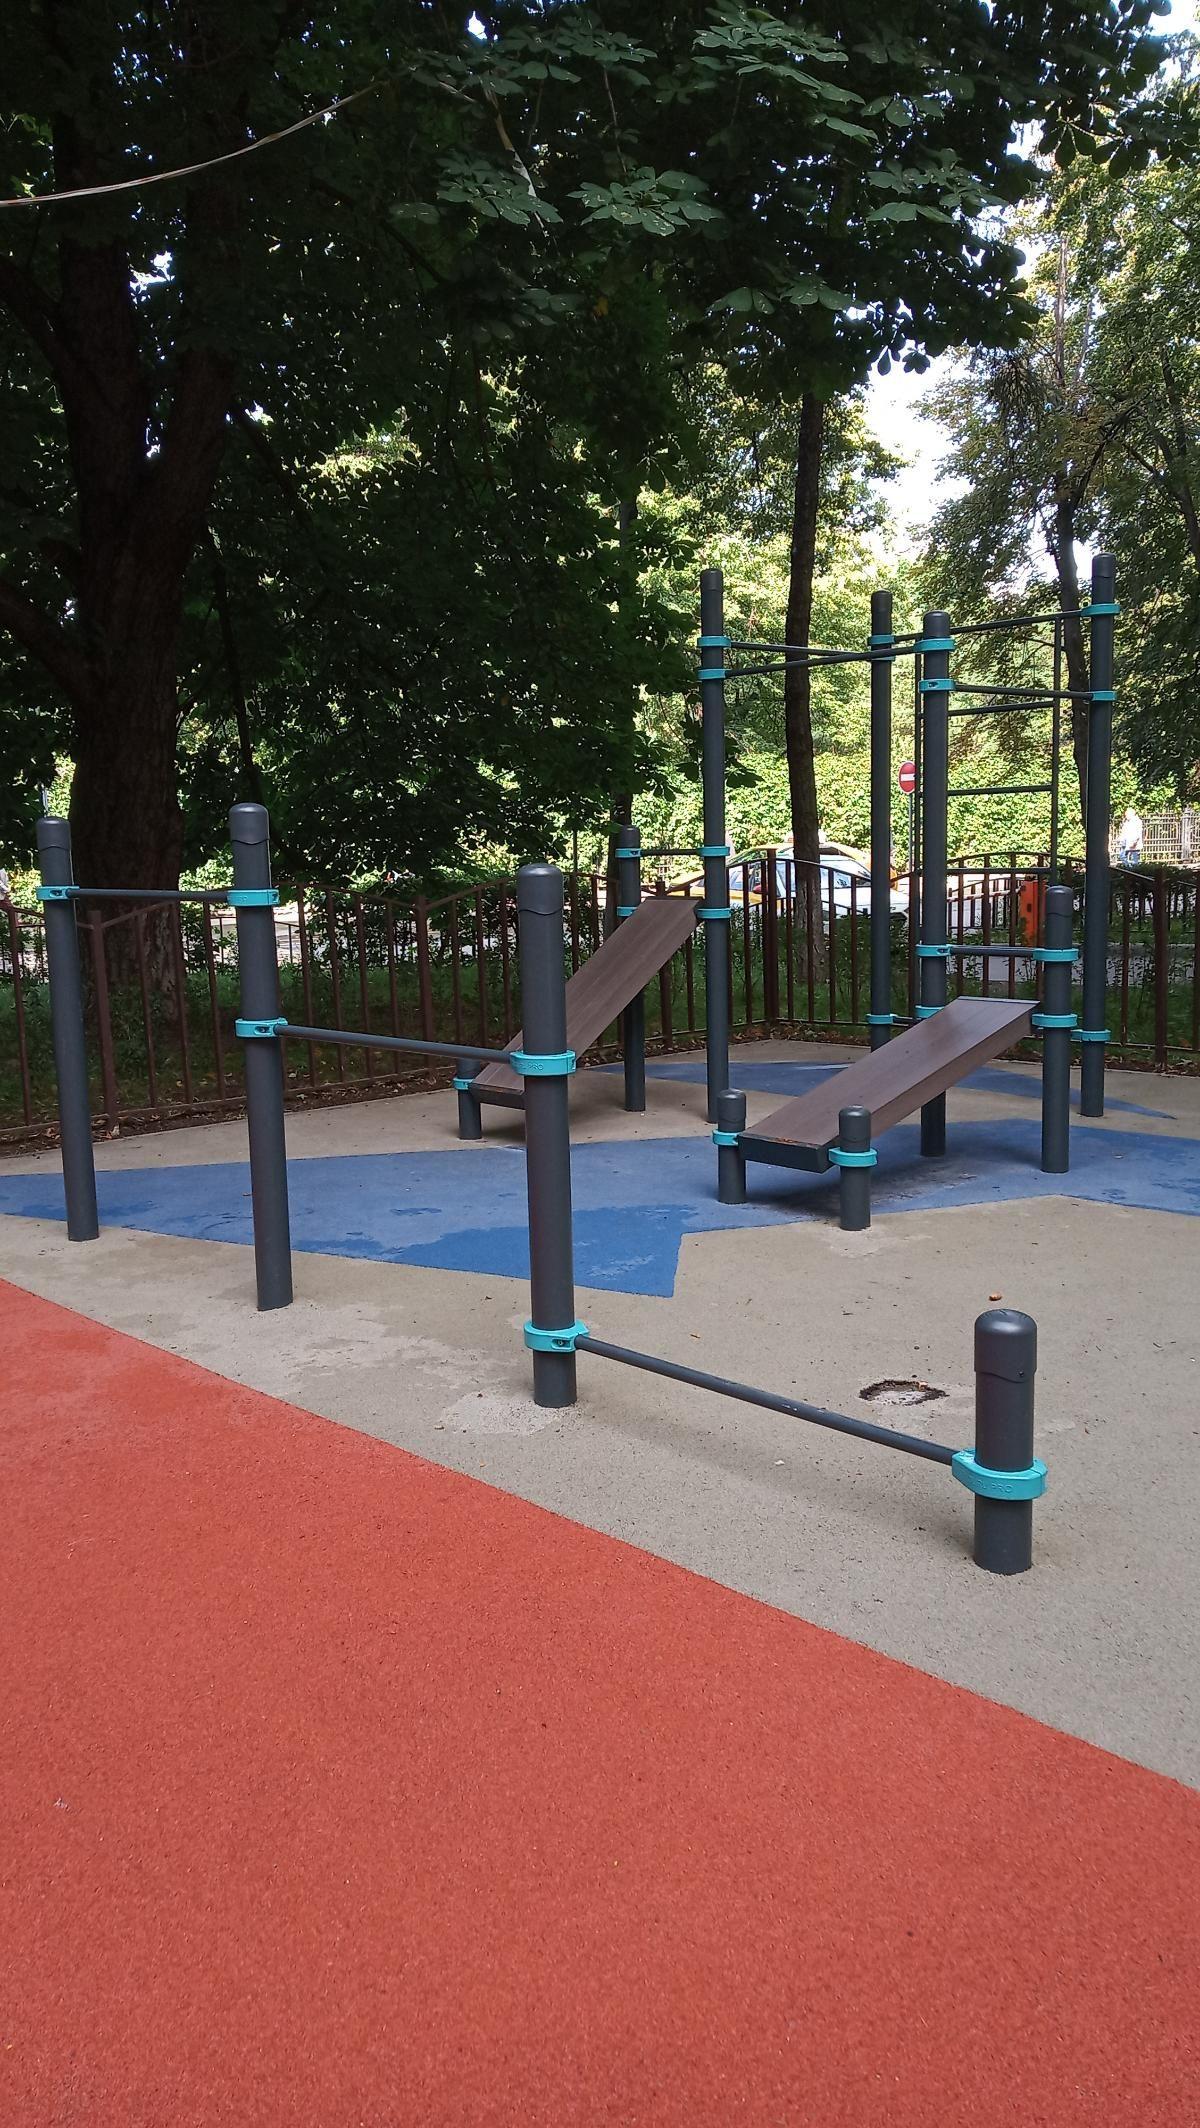 Moscow - Street Workout Park - Переулок Хользунова